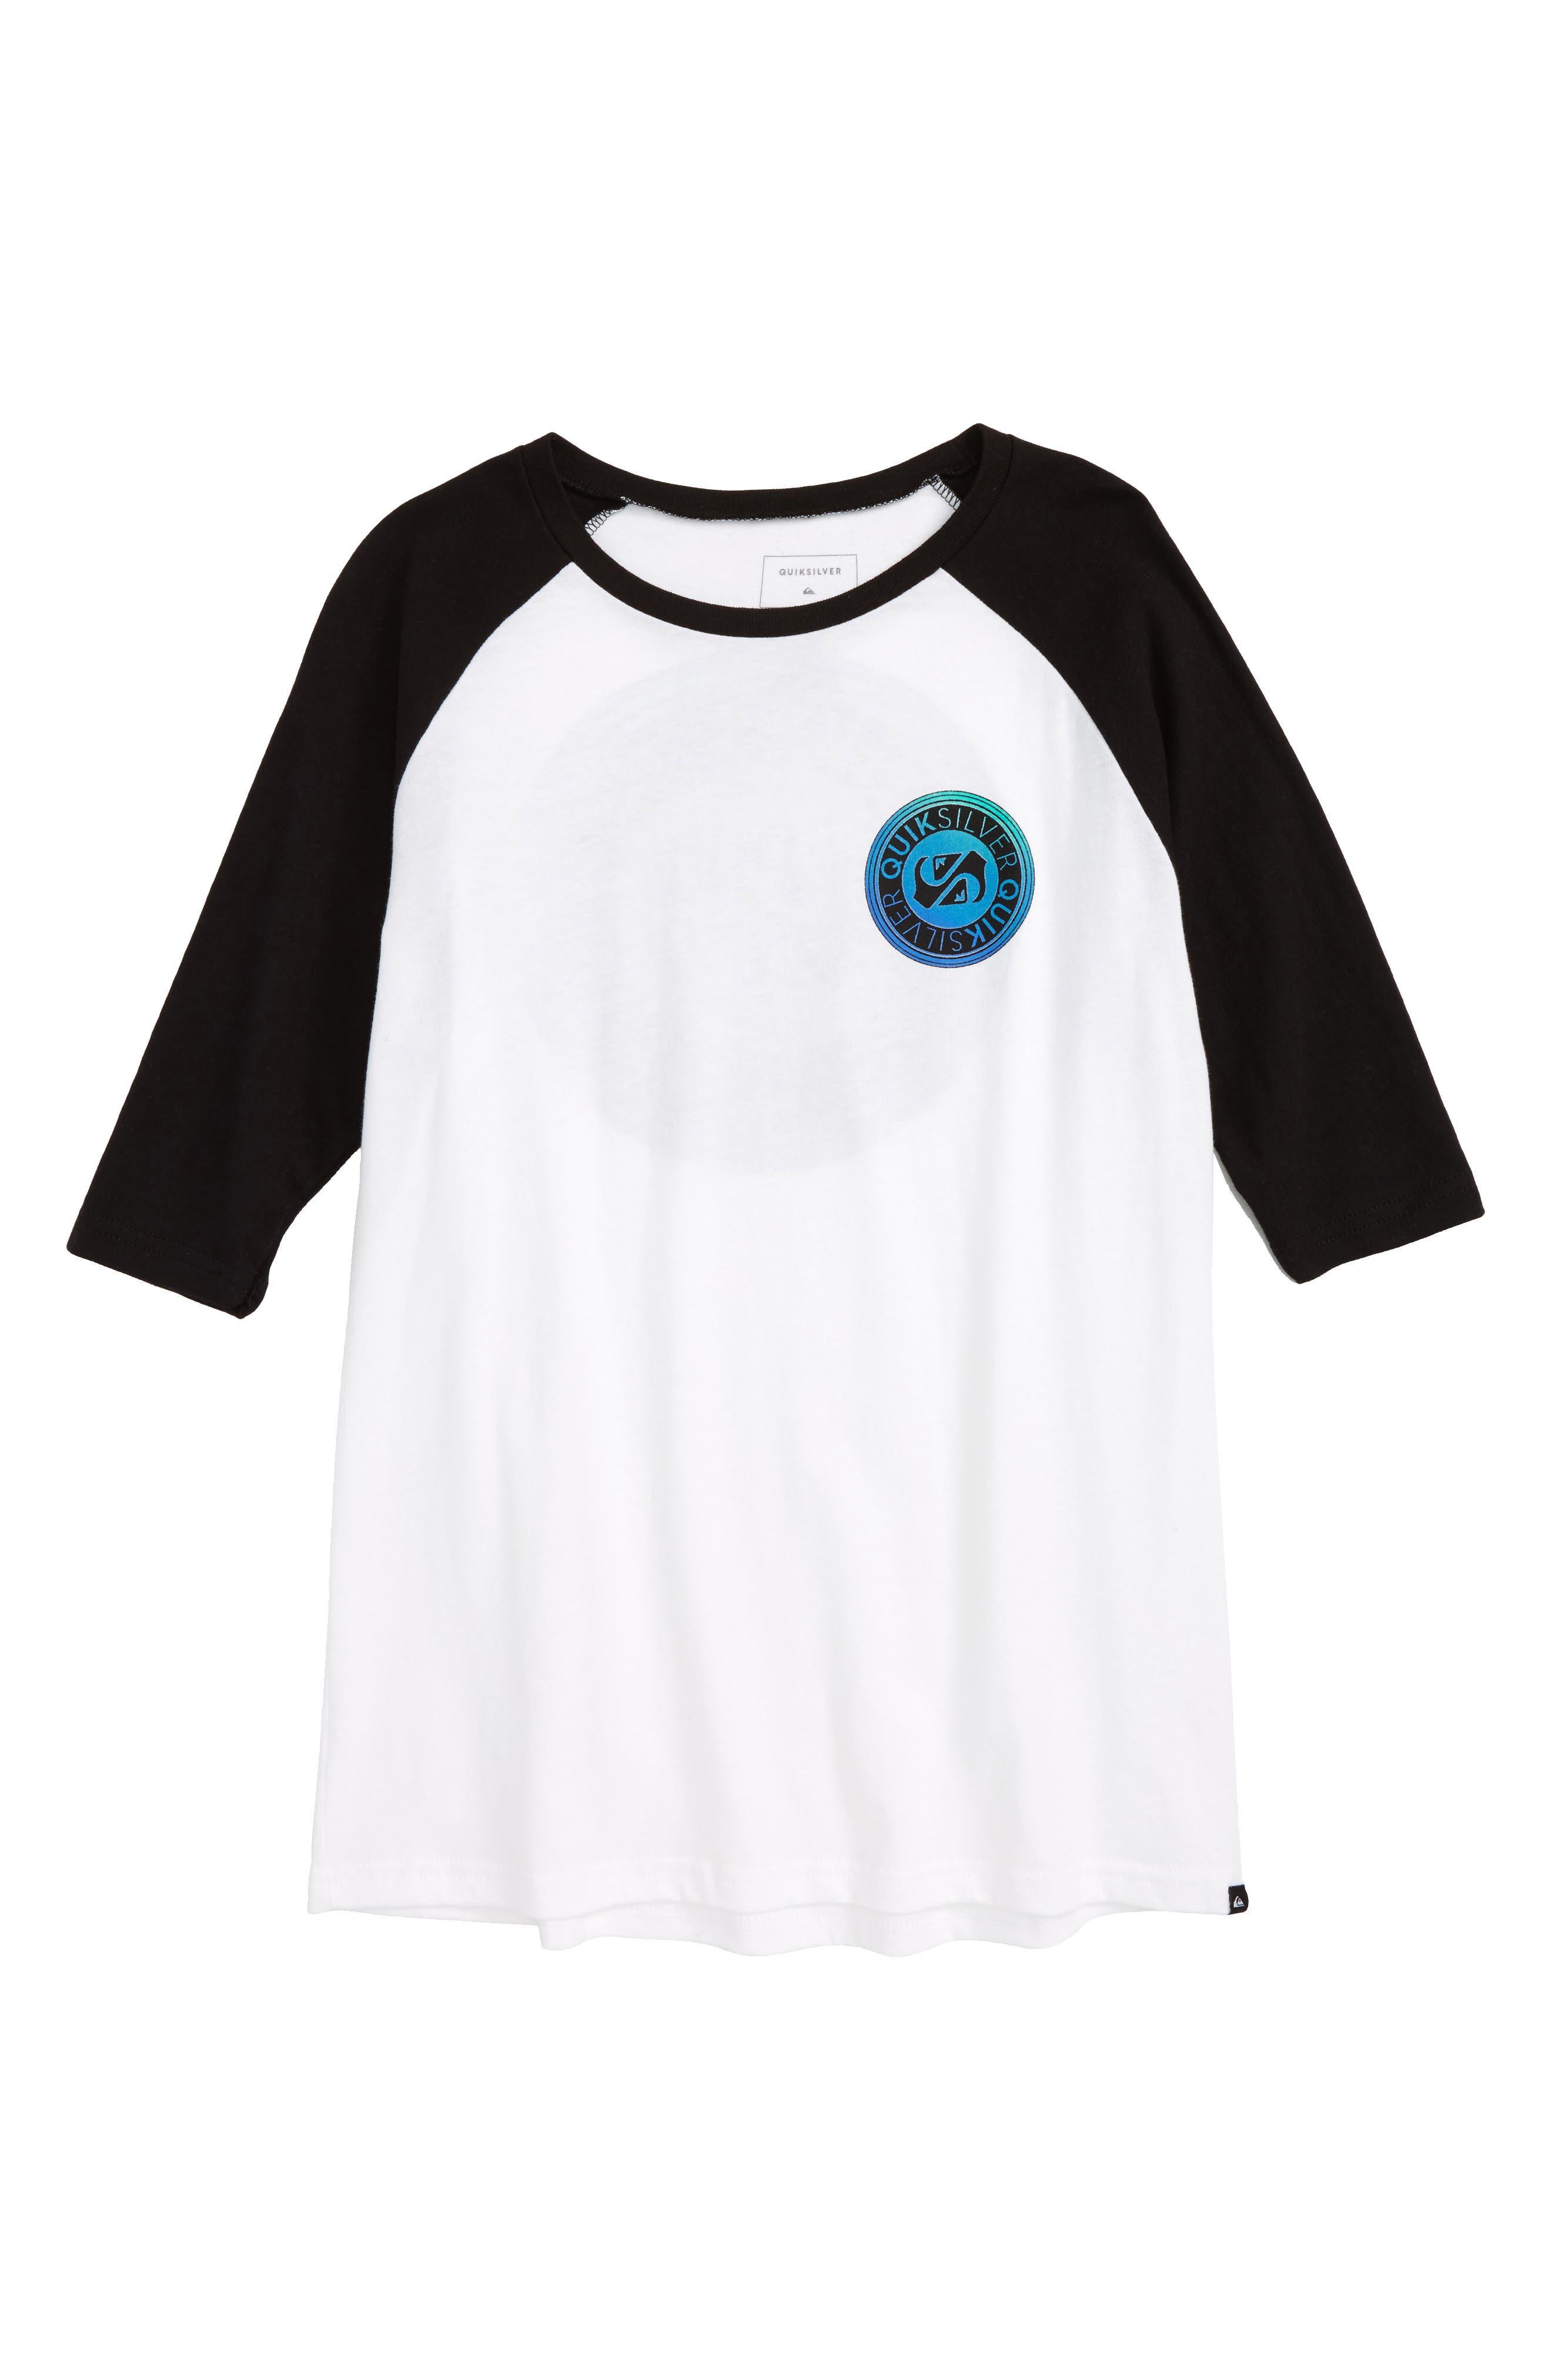 Main Image - Quiksilver International Raglan T-Shirt (Big Boys)